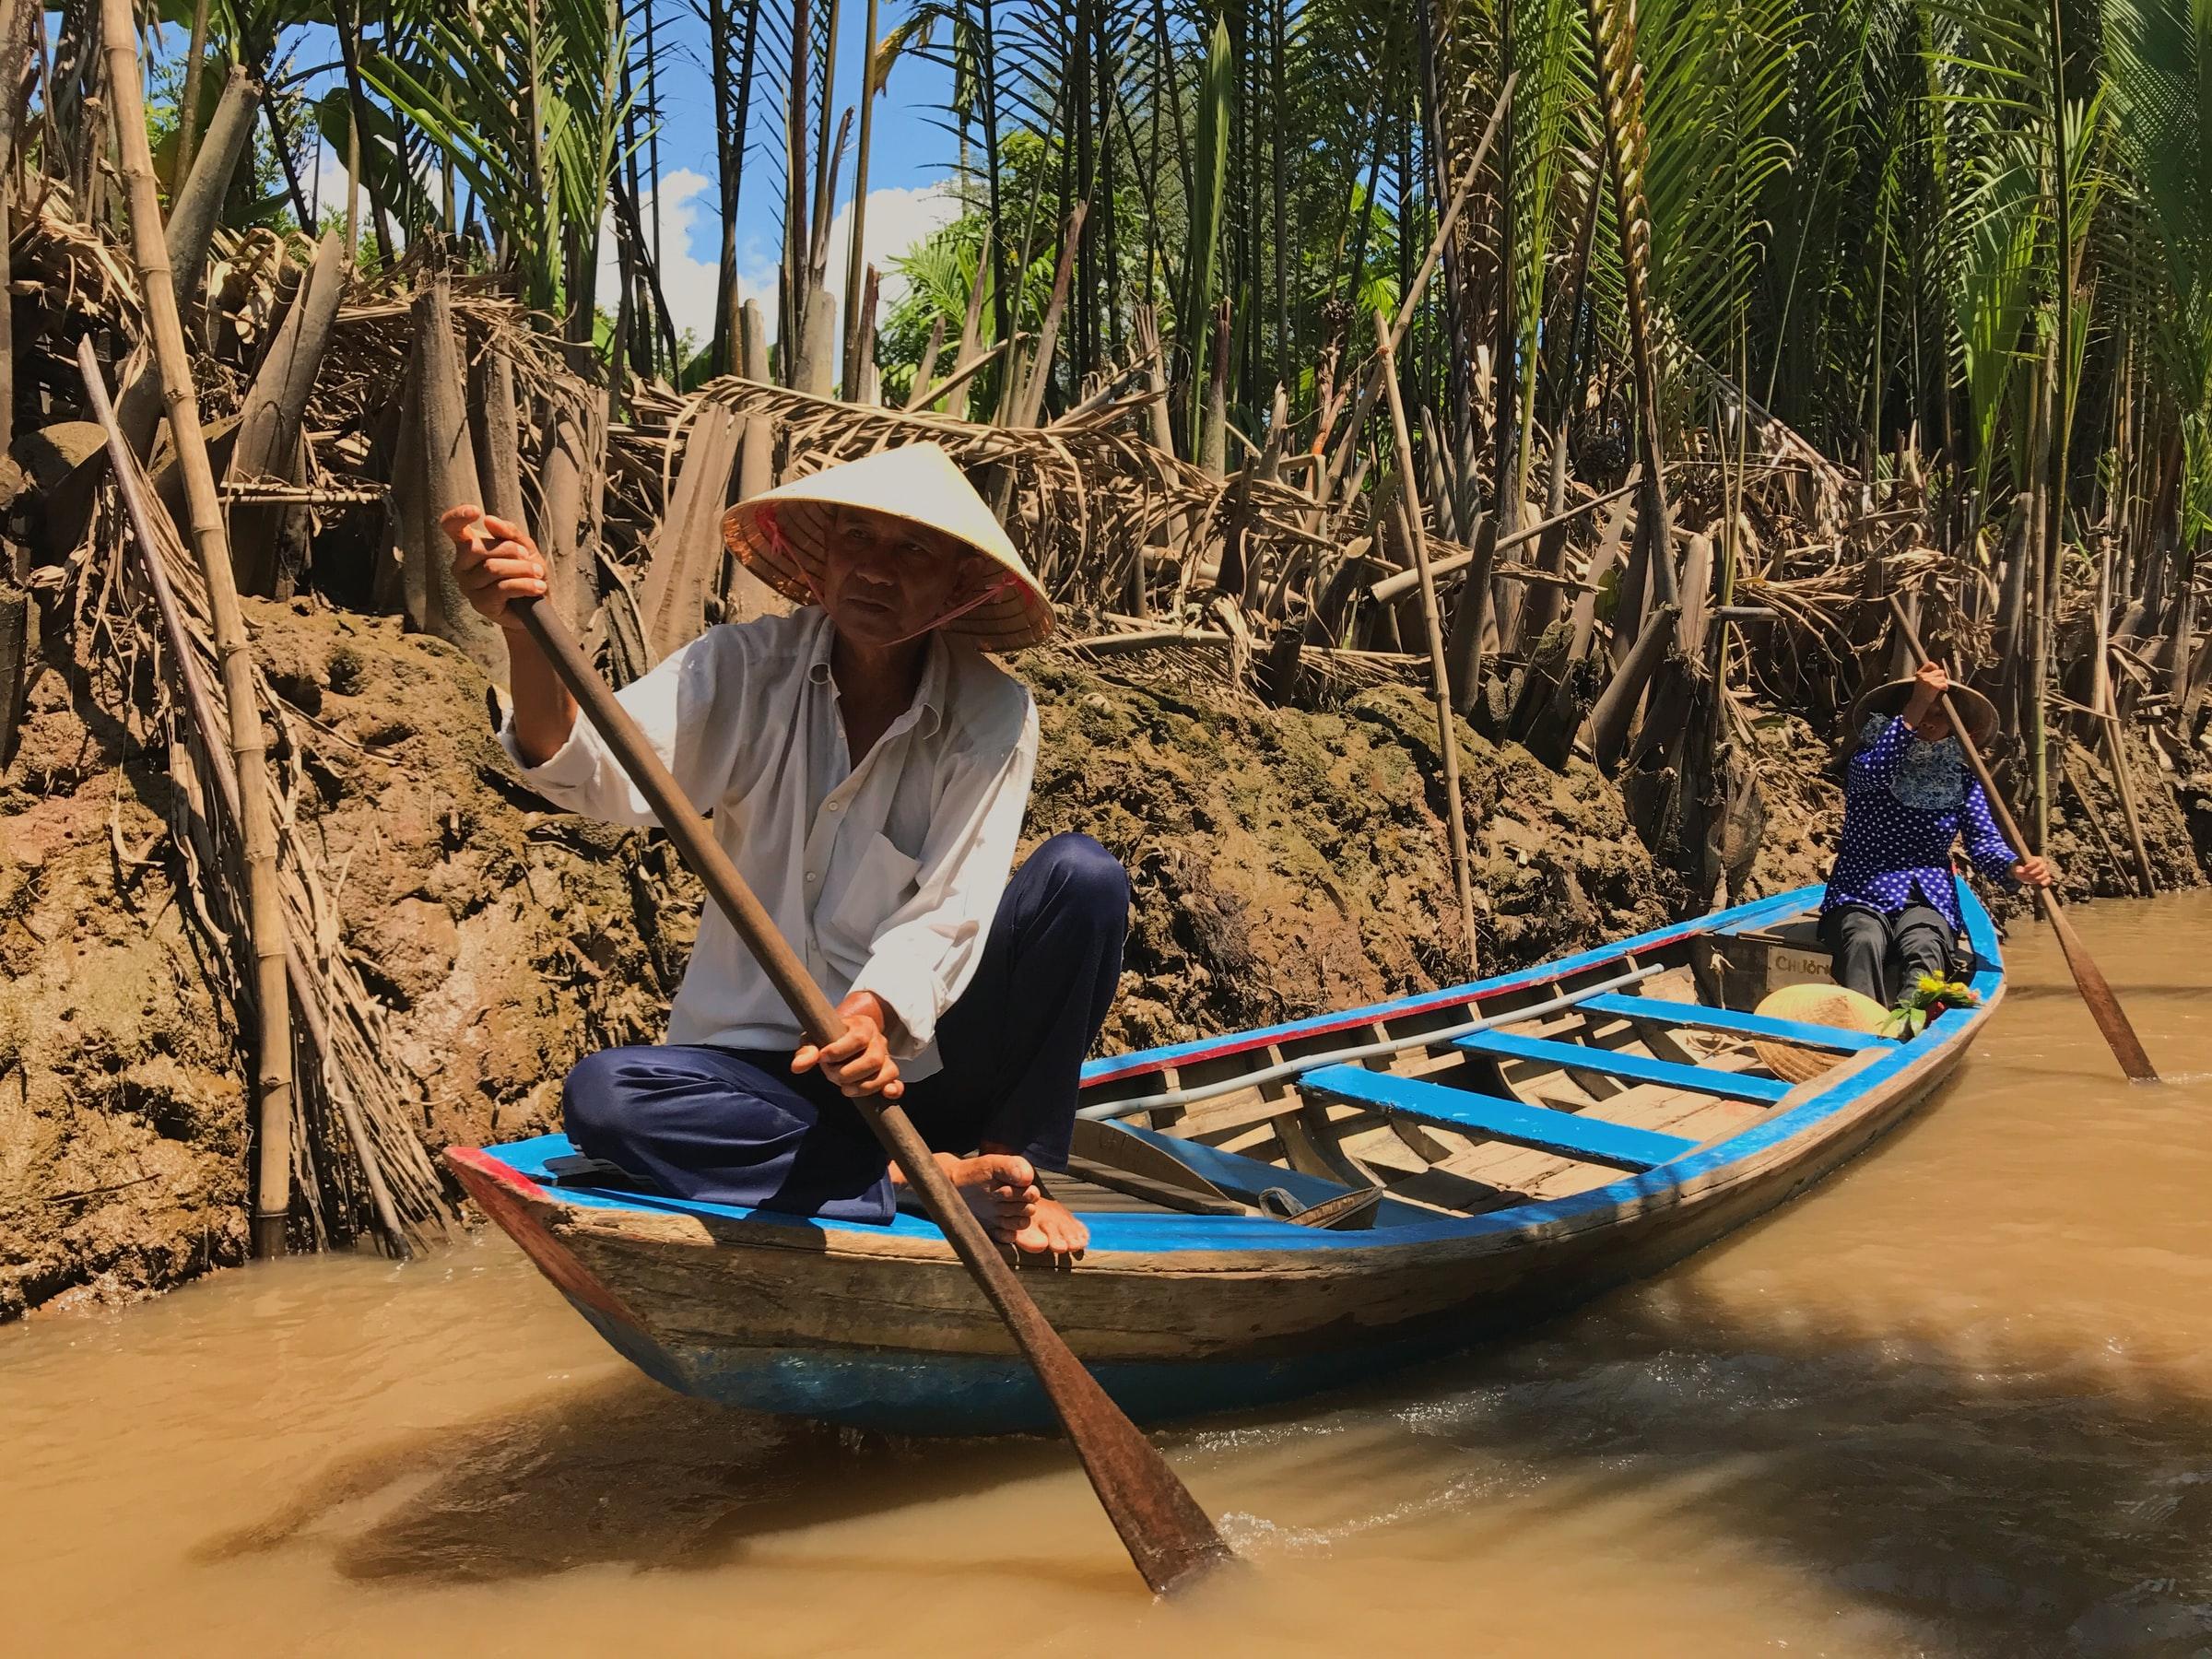 mekong river boat vietnam